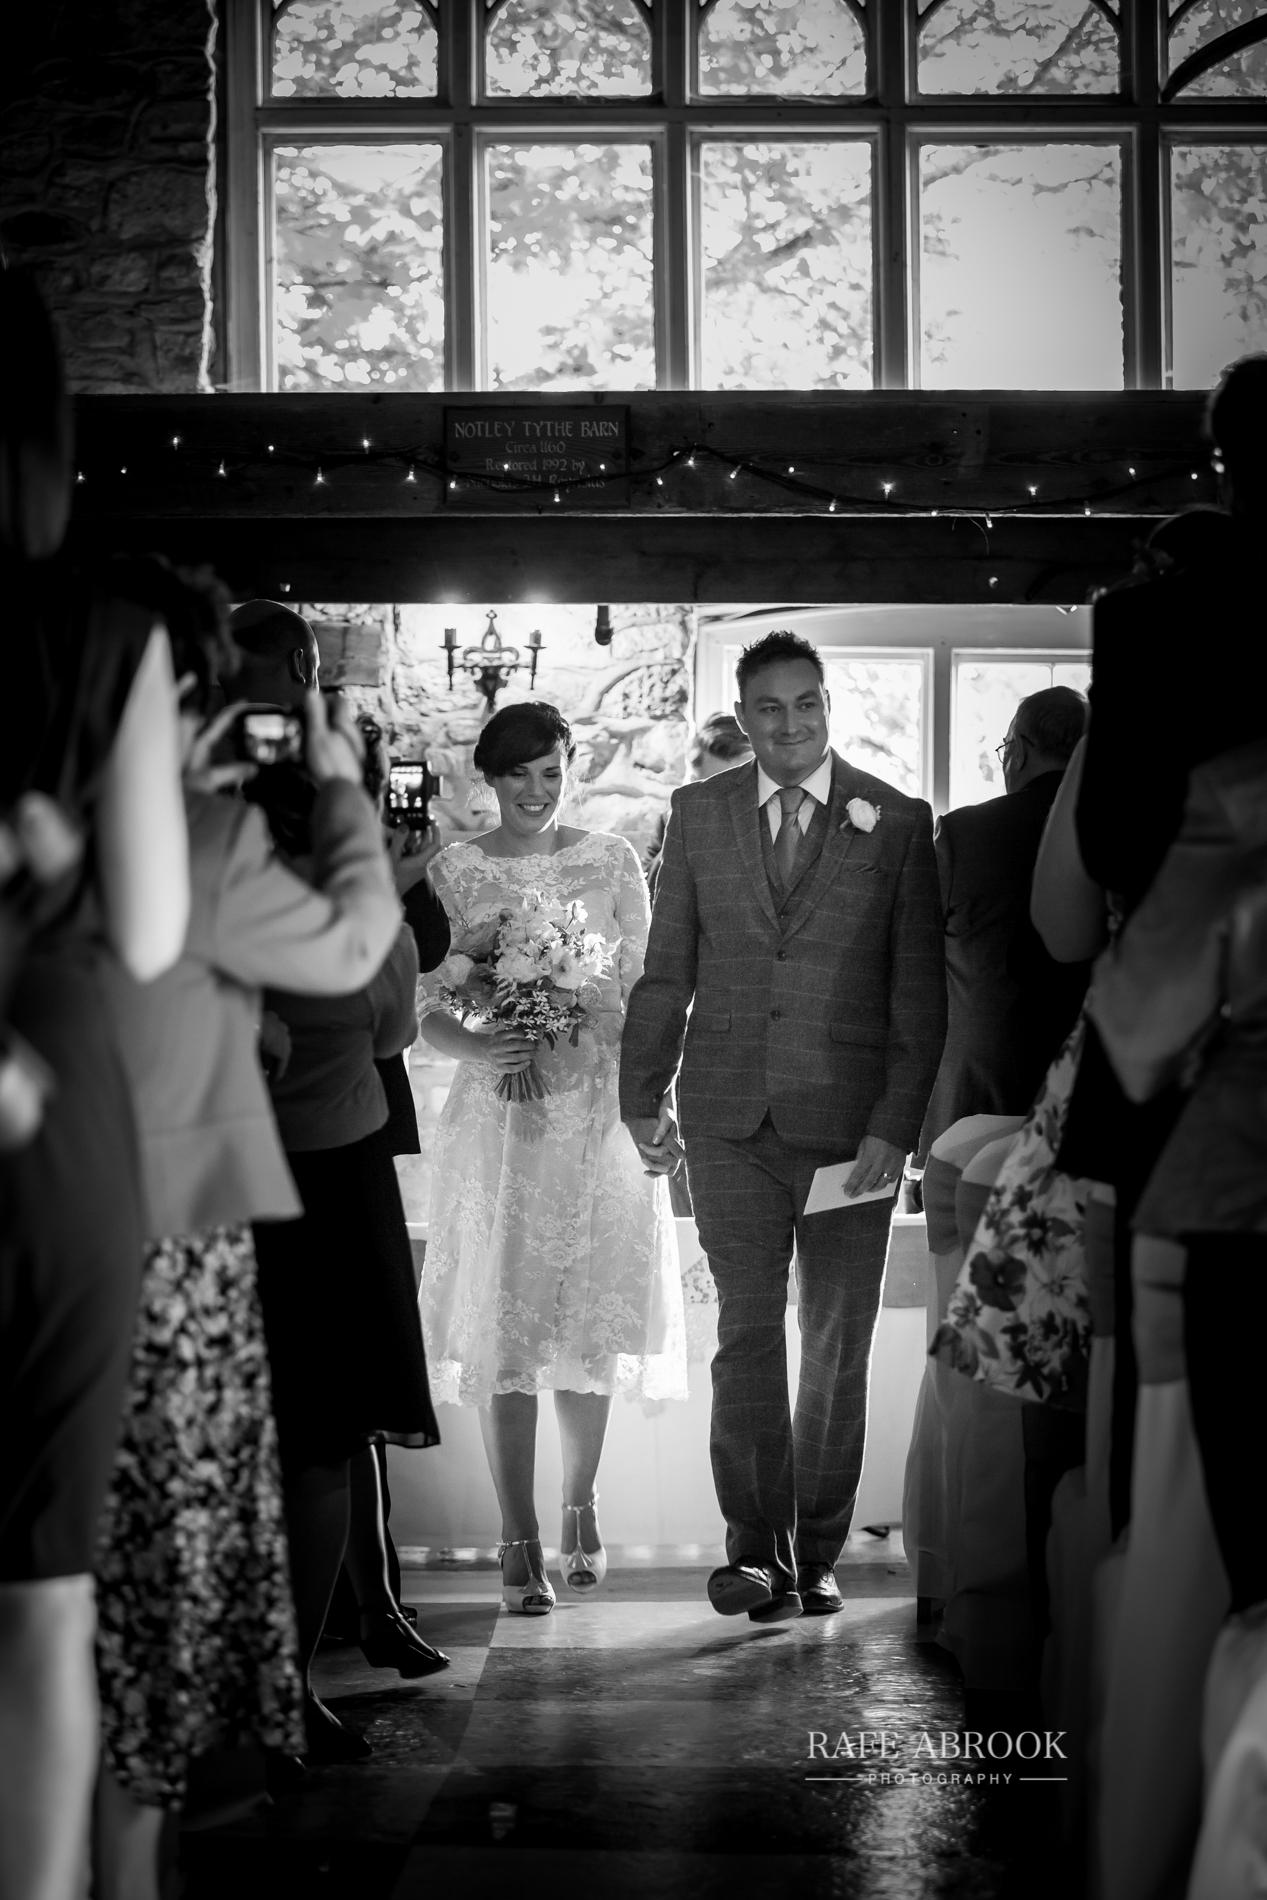 jon & laura wedding notley tythe barn wedding buckinghamshire-1214.jpg